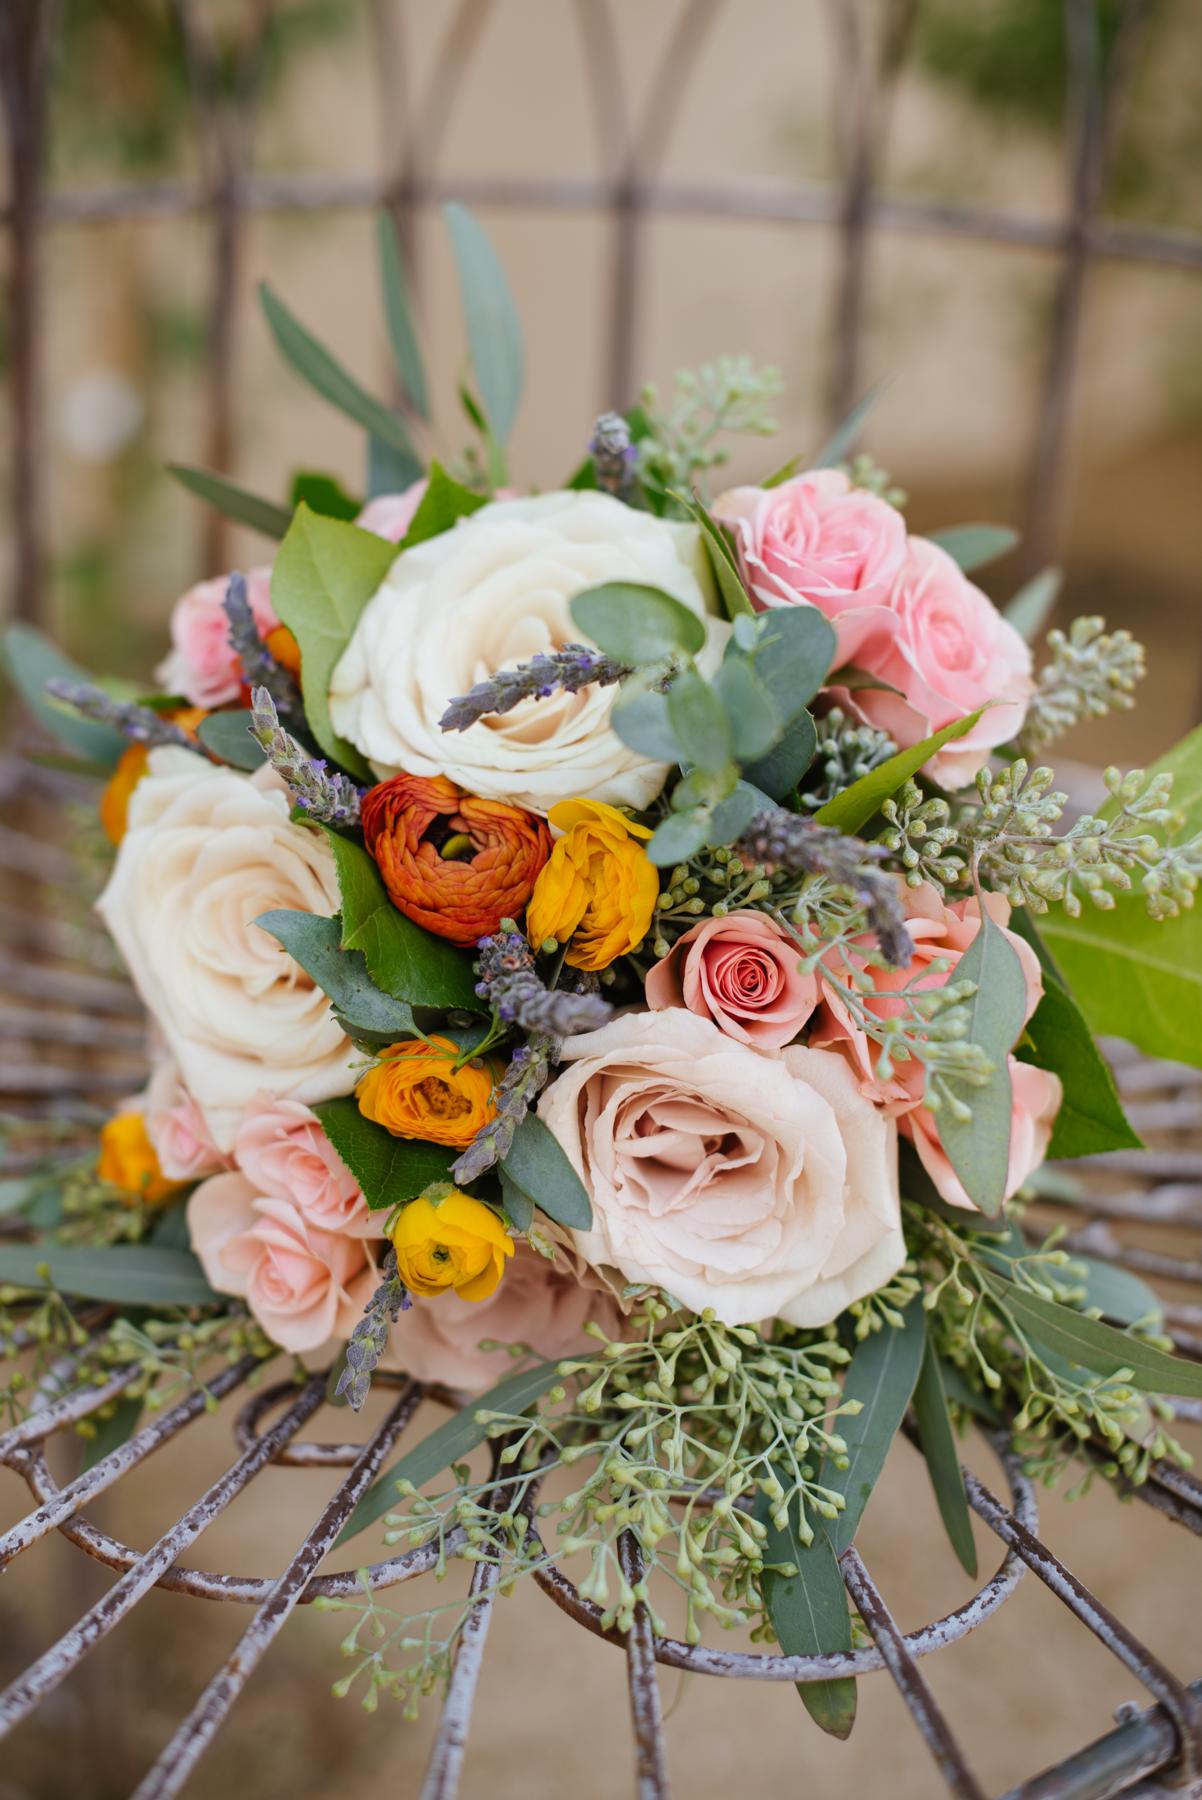 Secret Garden Event Center Wedding - Meredith Amadee Photography-49.jpg